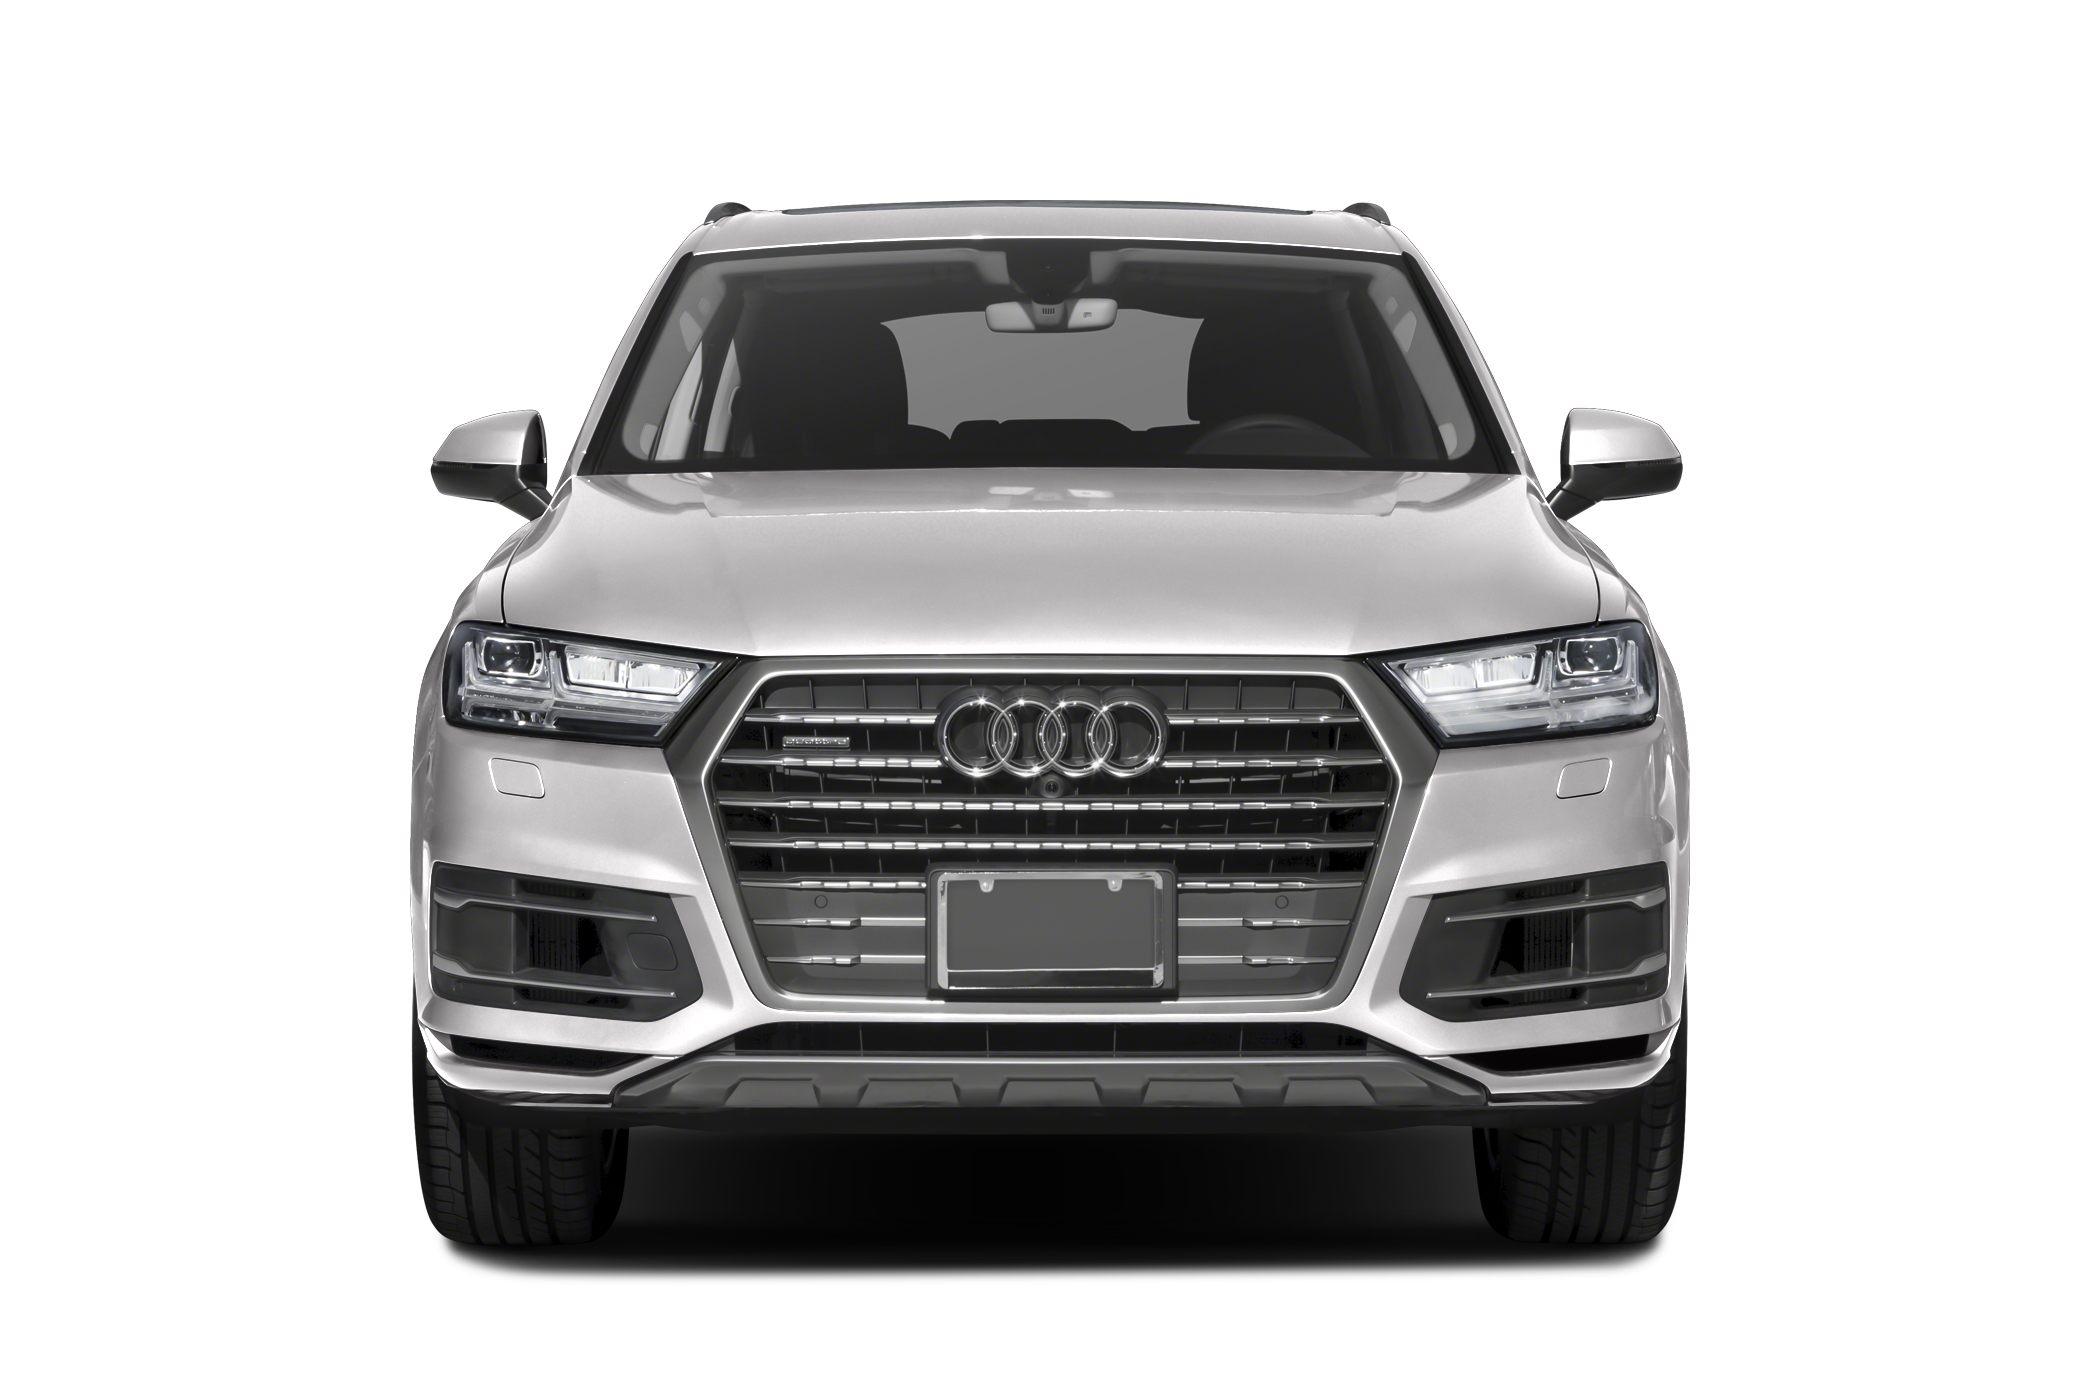 Audi Q7 Lease Prices >> 2018 Audi Q7 Pictures & Photos - CarsDirect